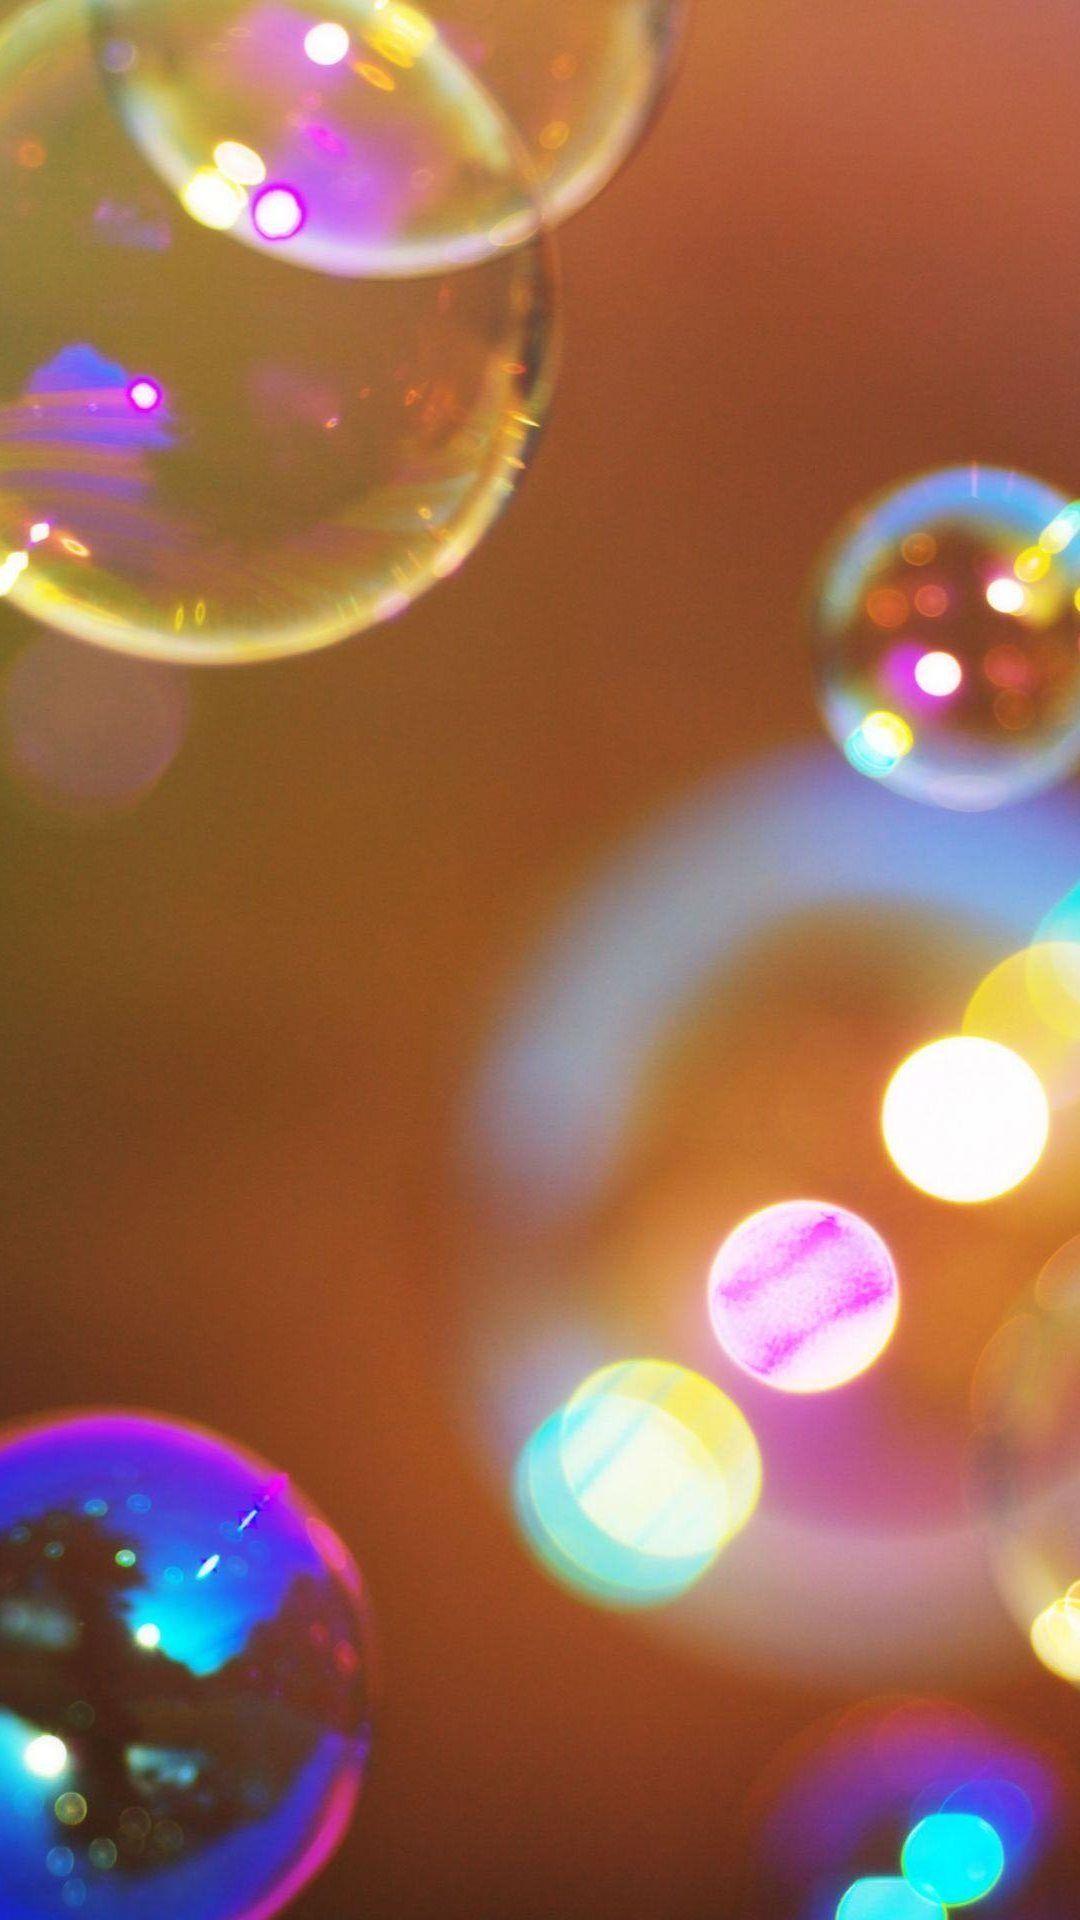 خلفيات ايفون 2019 خلفيات رائعة ومميزة Iphone 7 Wallpaper The Flash Tecnologis Bubbles Wallpaper Bubbles Photography Soap Bubbles